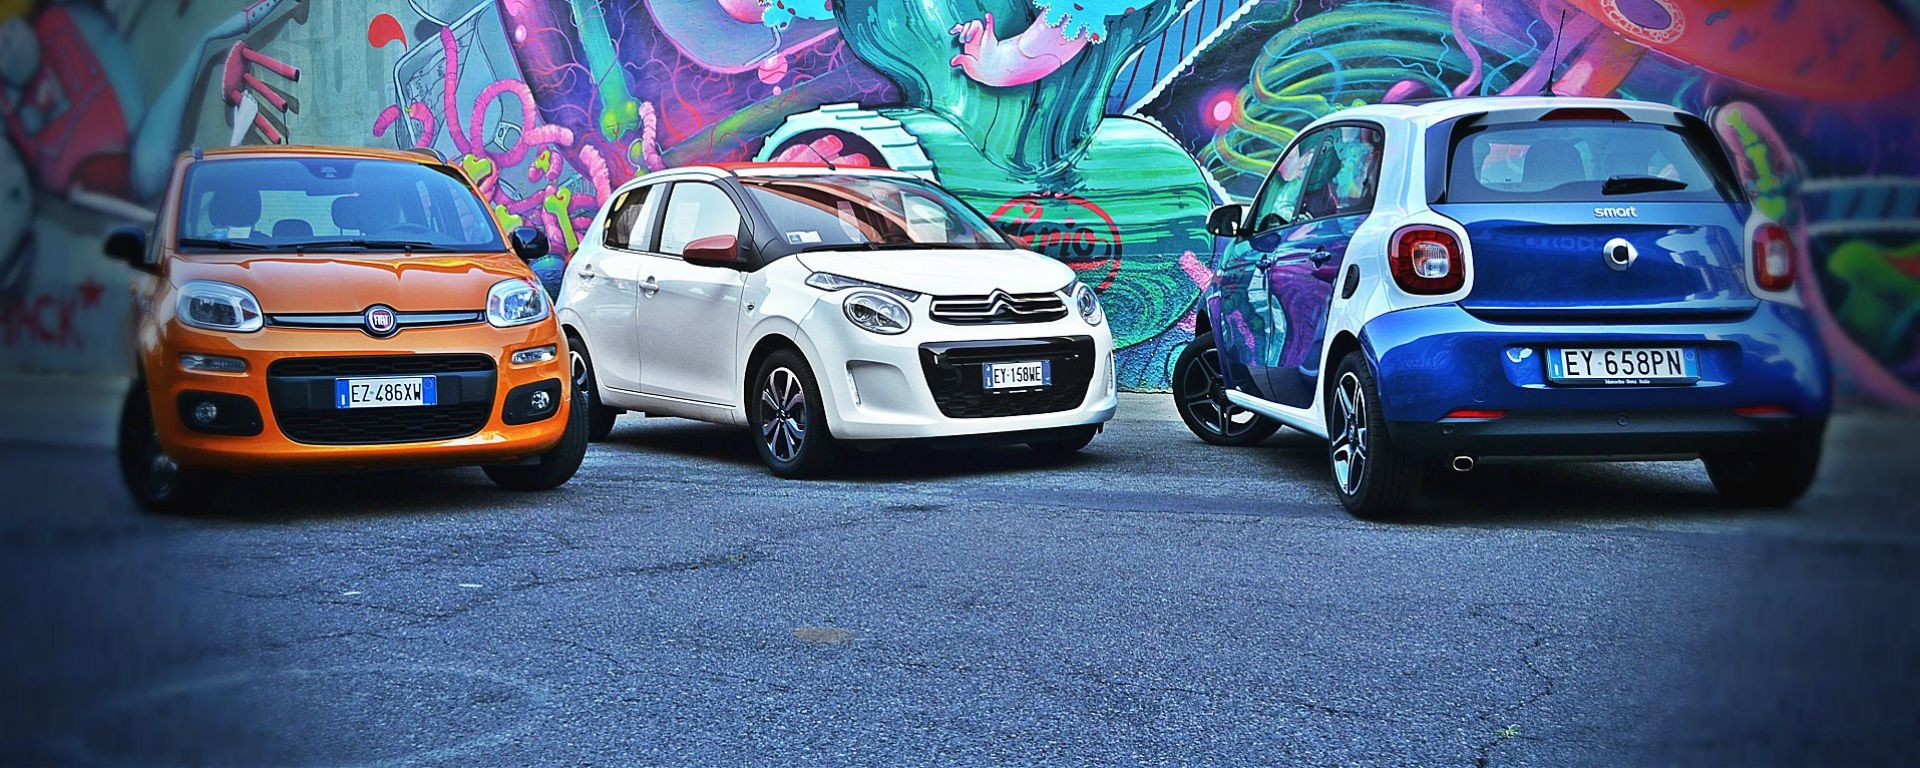 Citroën C1 vs Fiat Panda vs Smart forfour